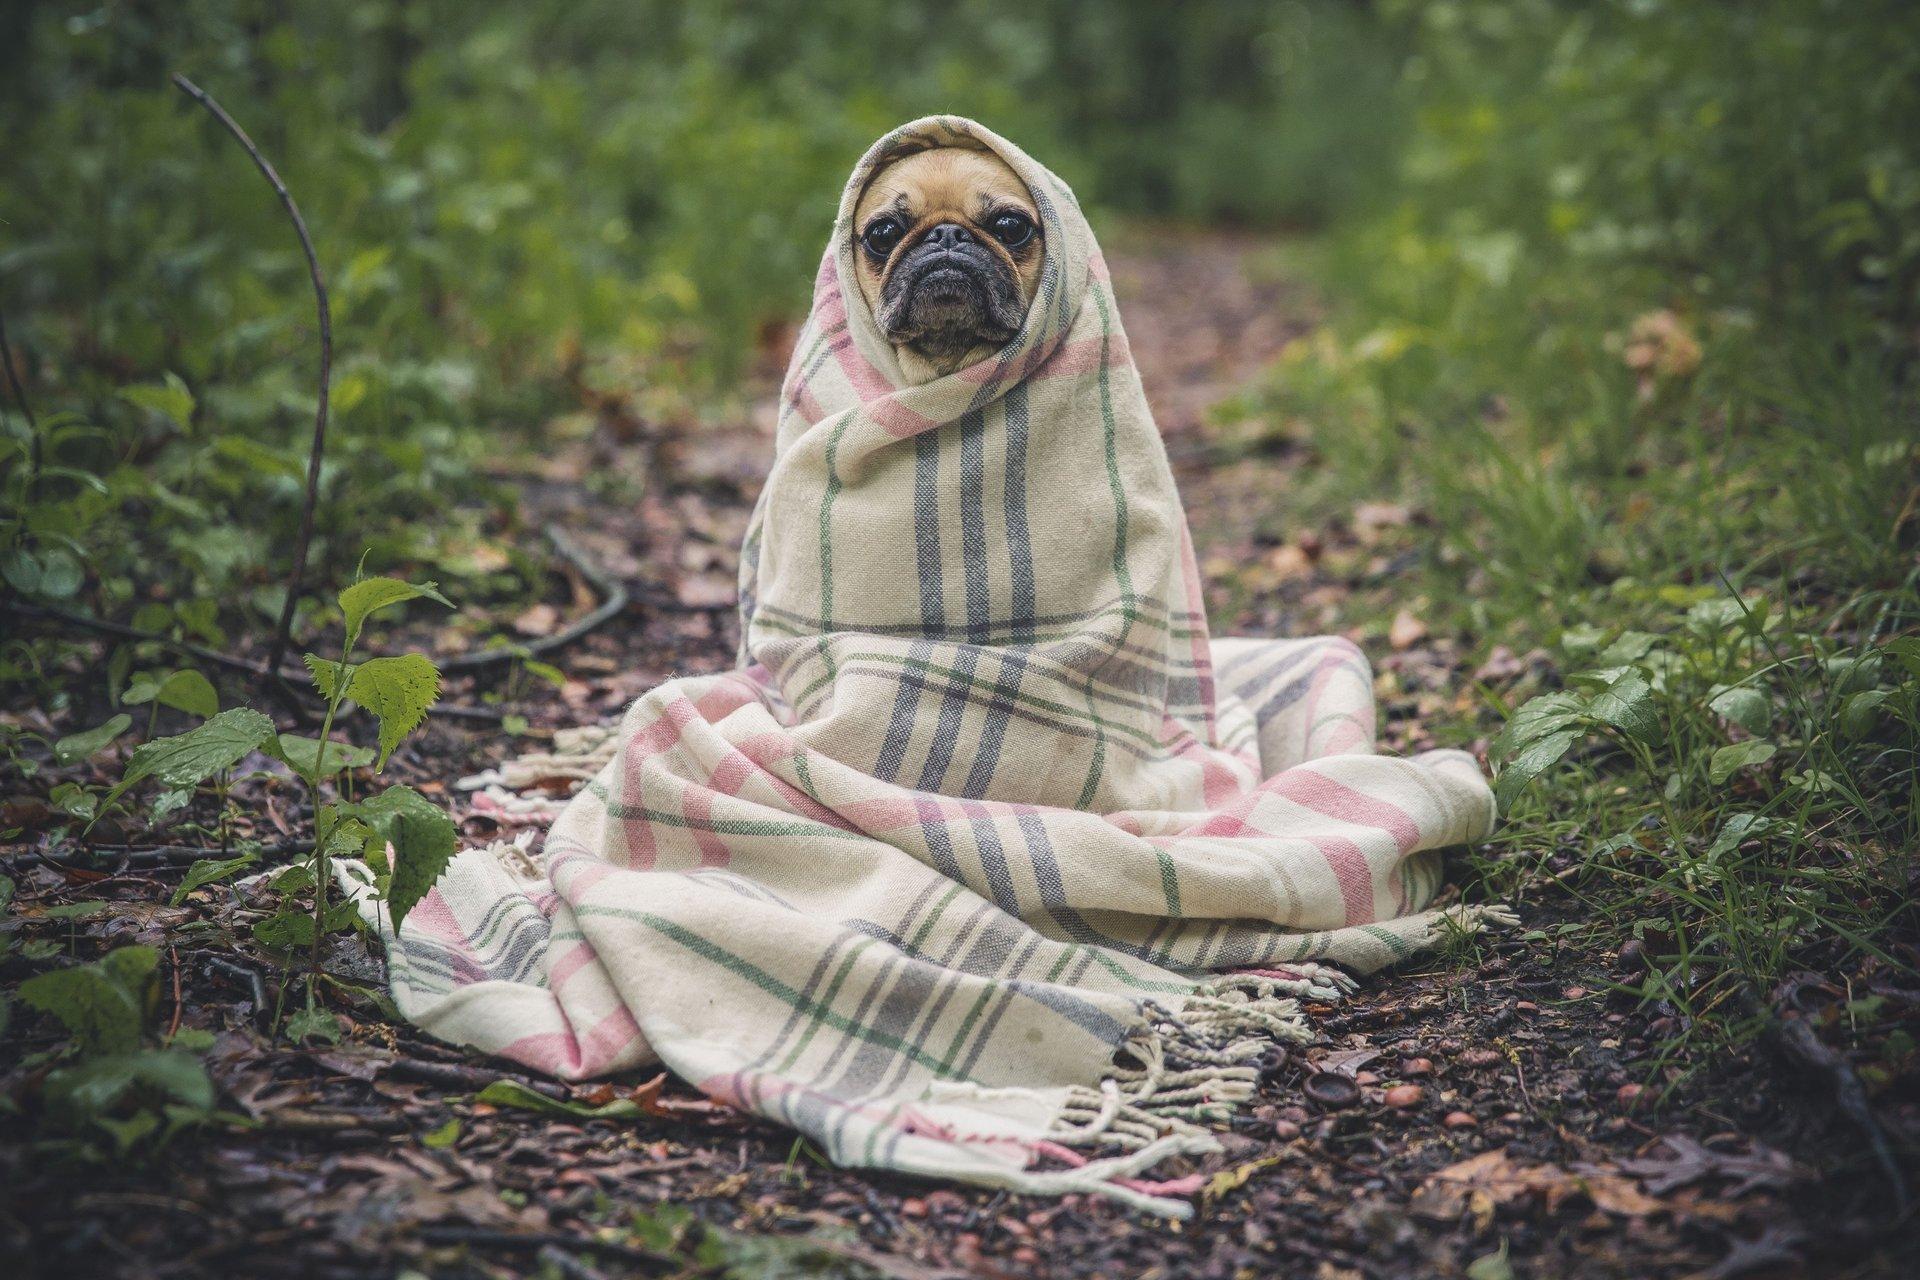 Puggerino in a Blanket